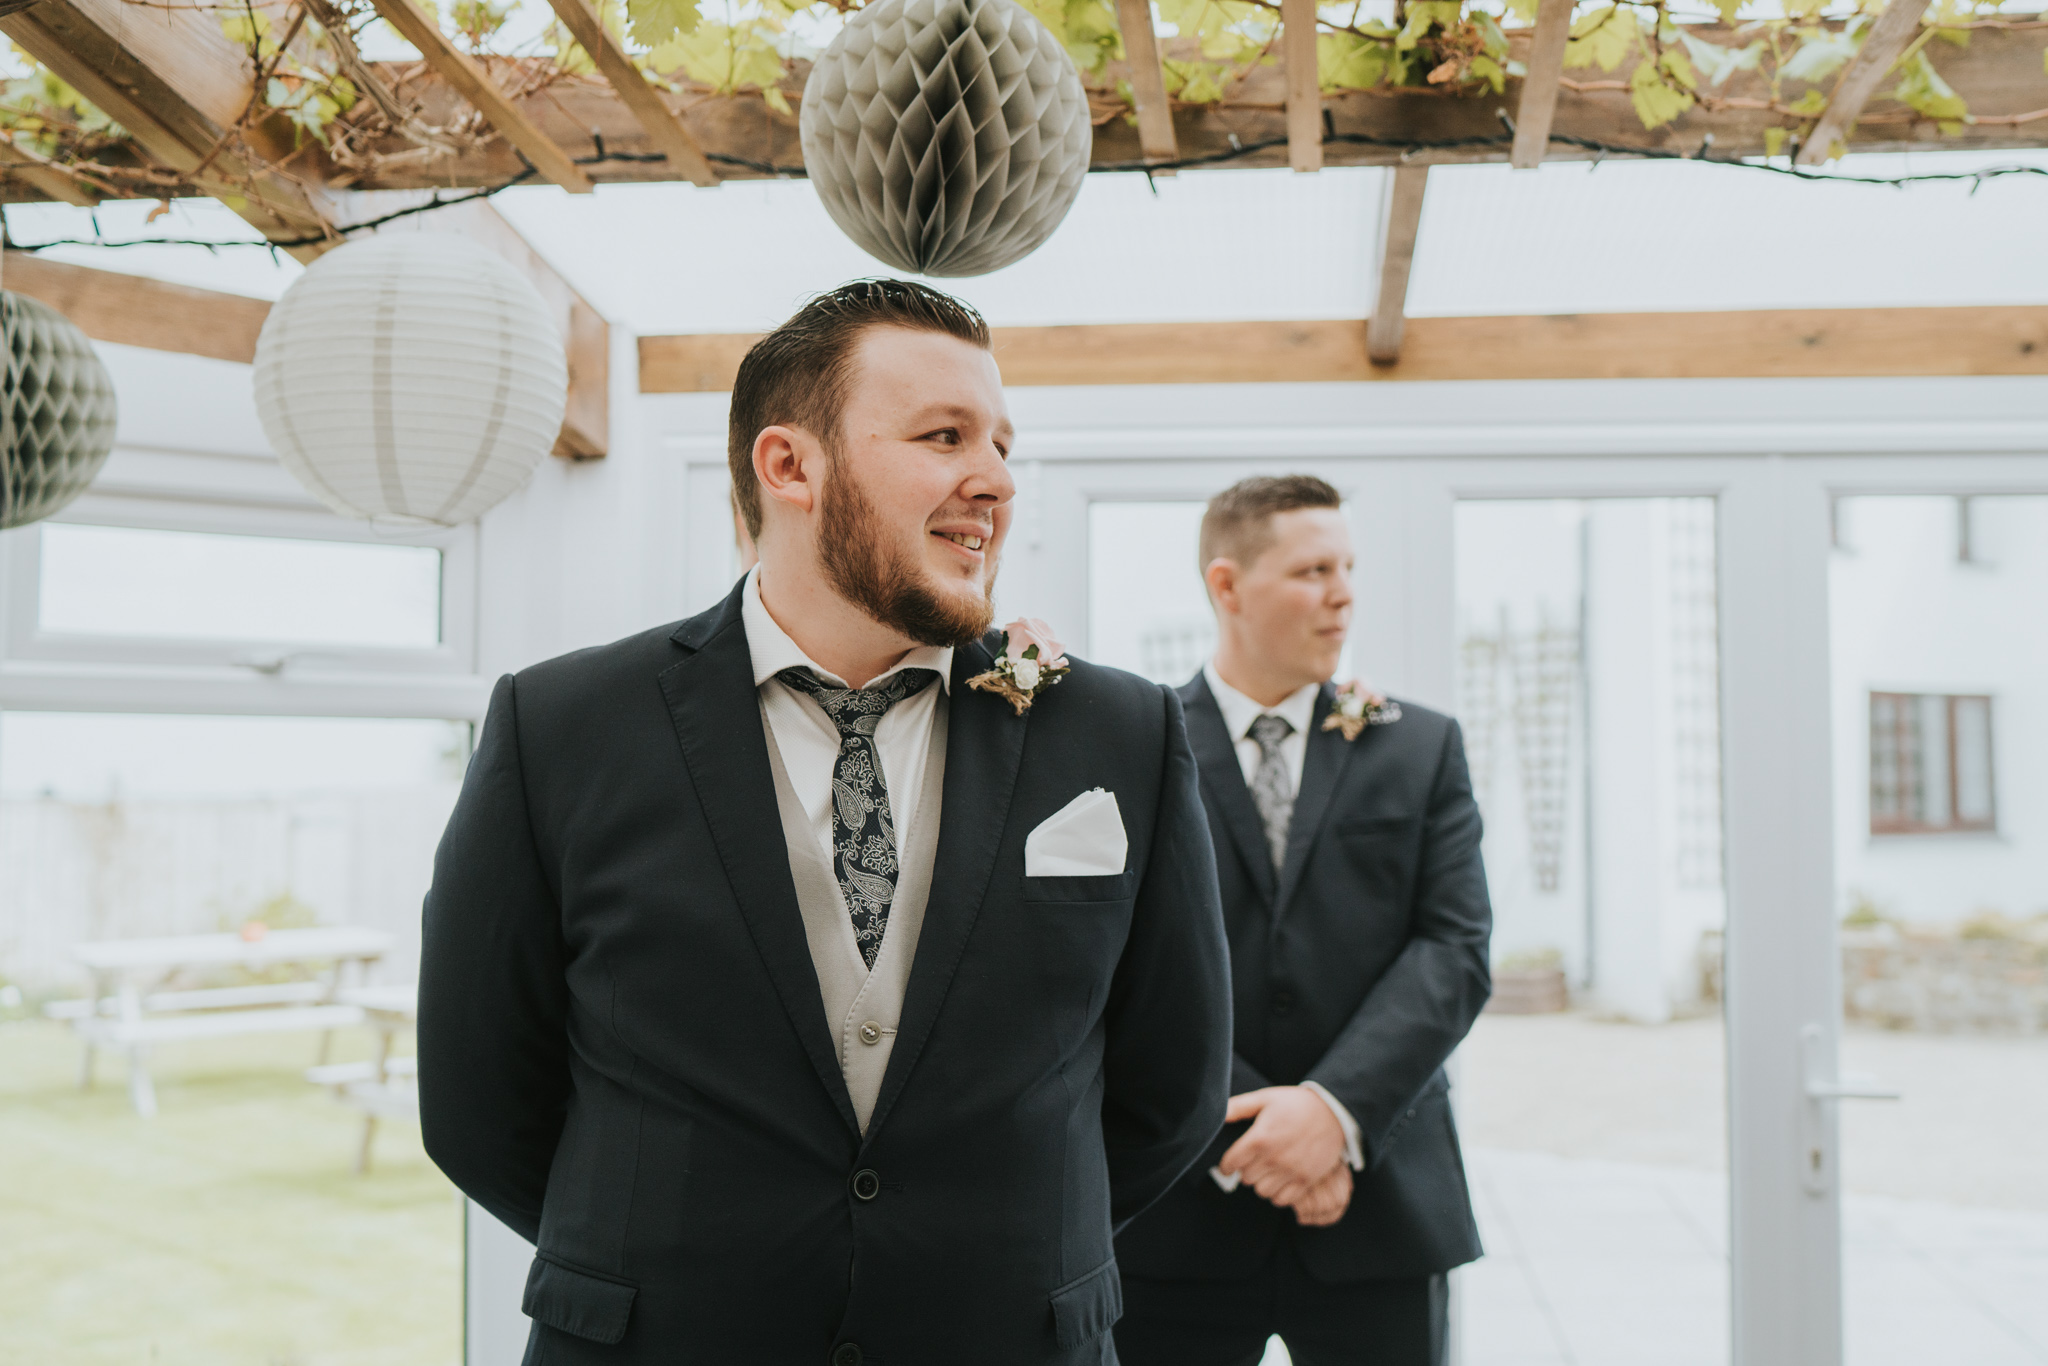 grace-sam-old-barn-clovelly-devon-wedding-photographer-grace-elizabeth-essex-suffolk-norfolk-wedding-photographer (42 of 132).jpg